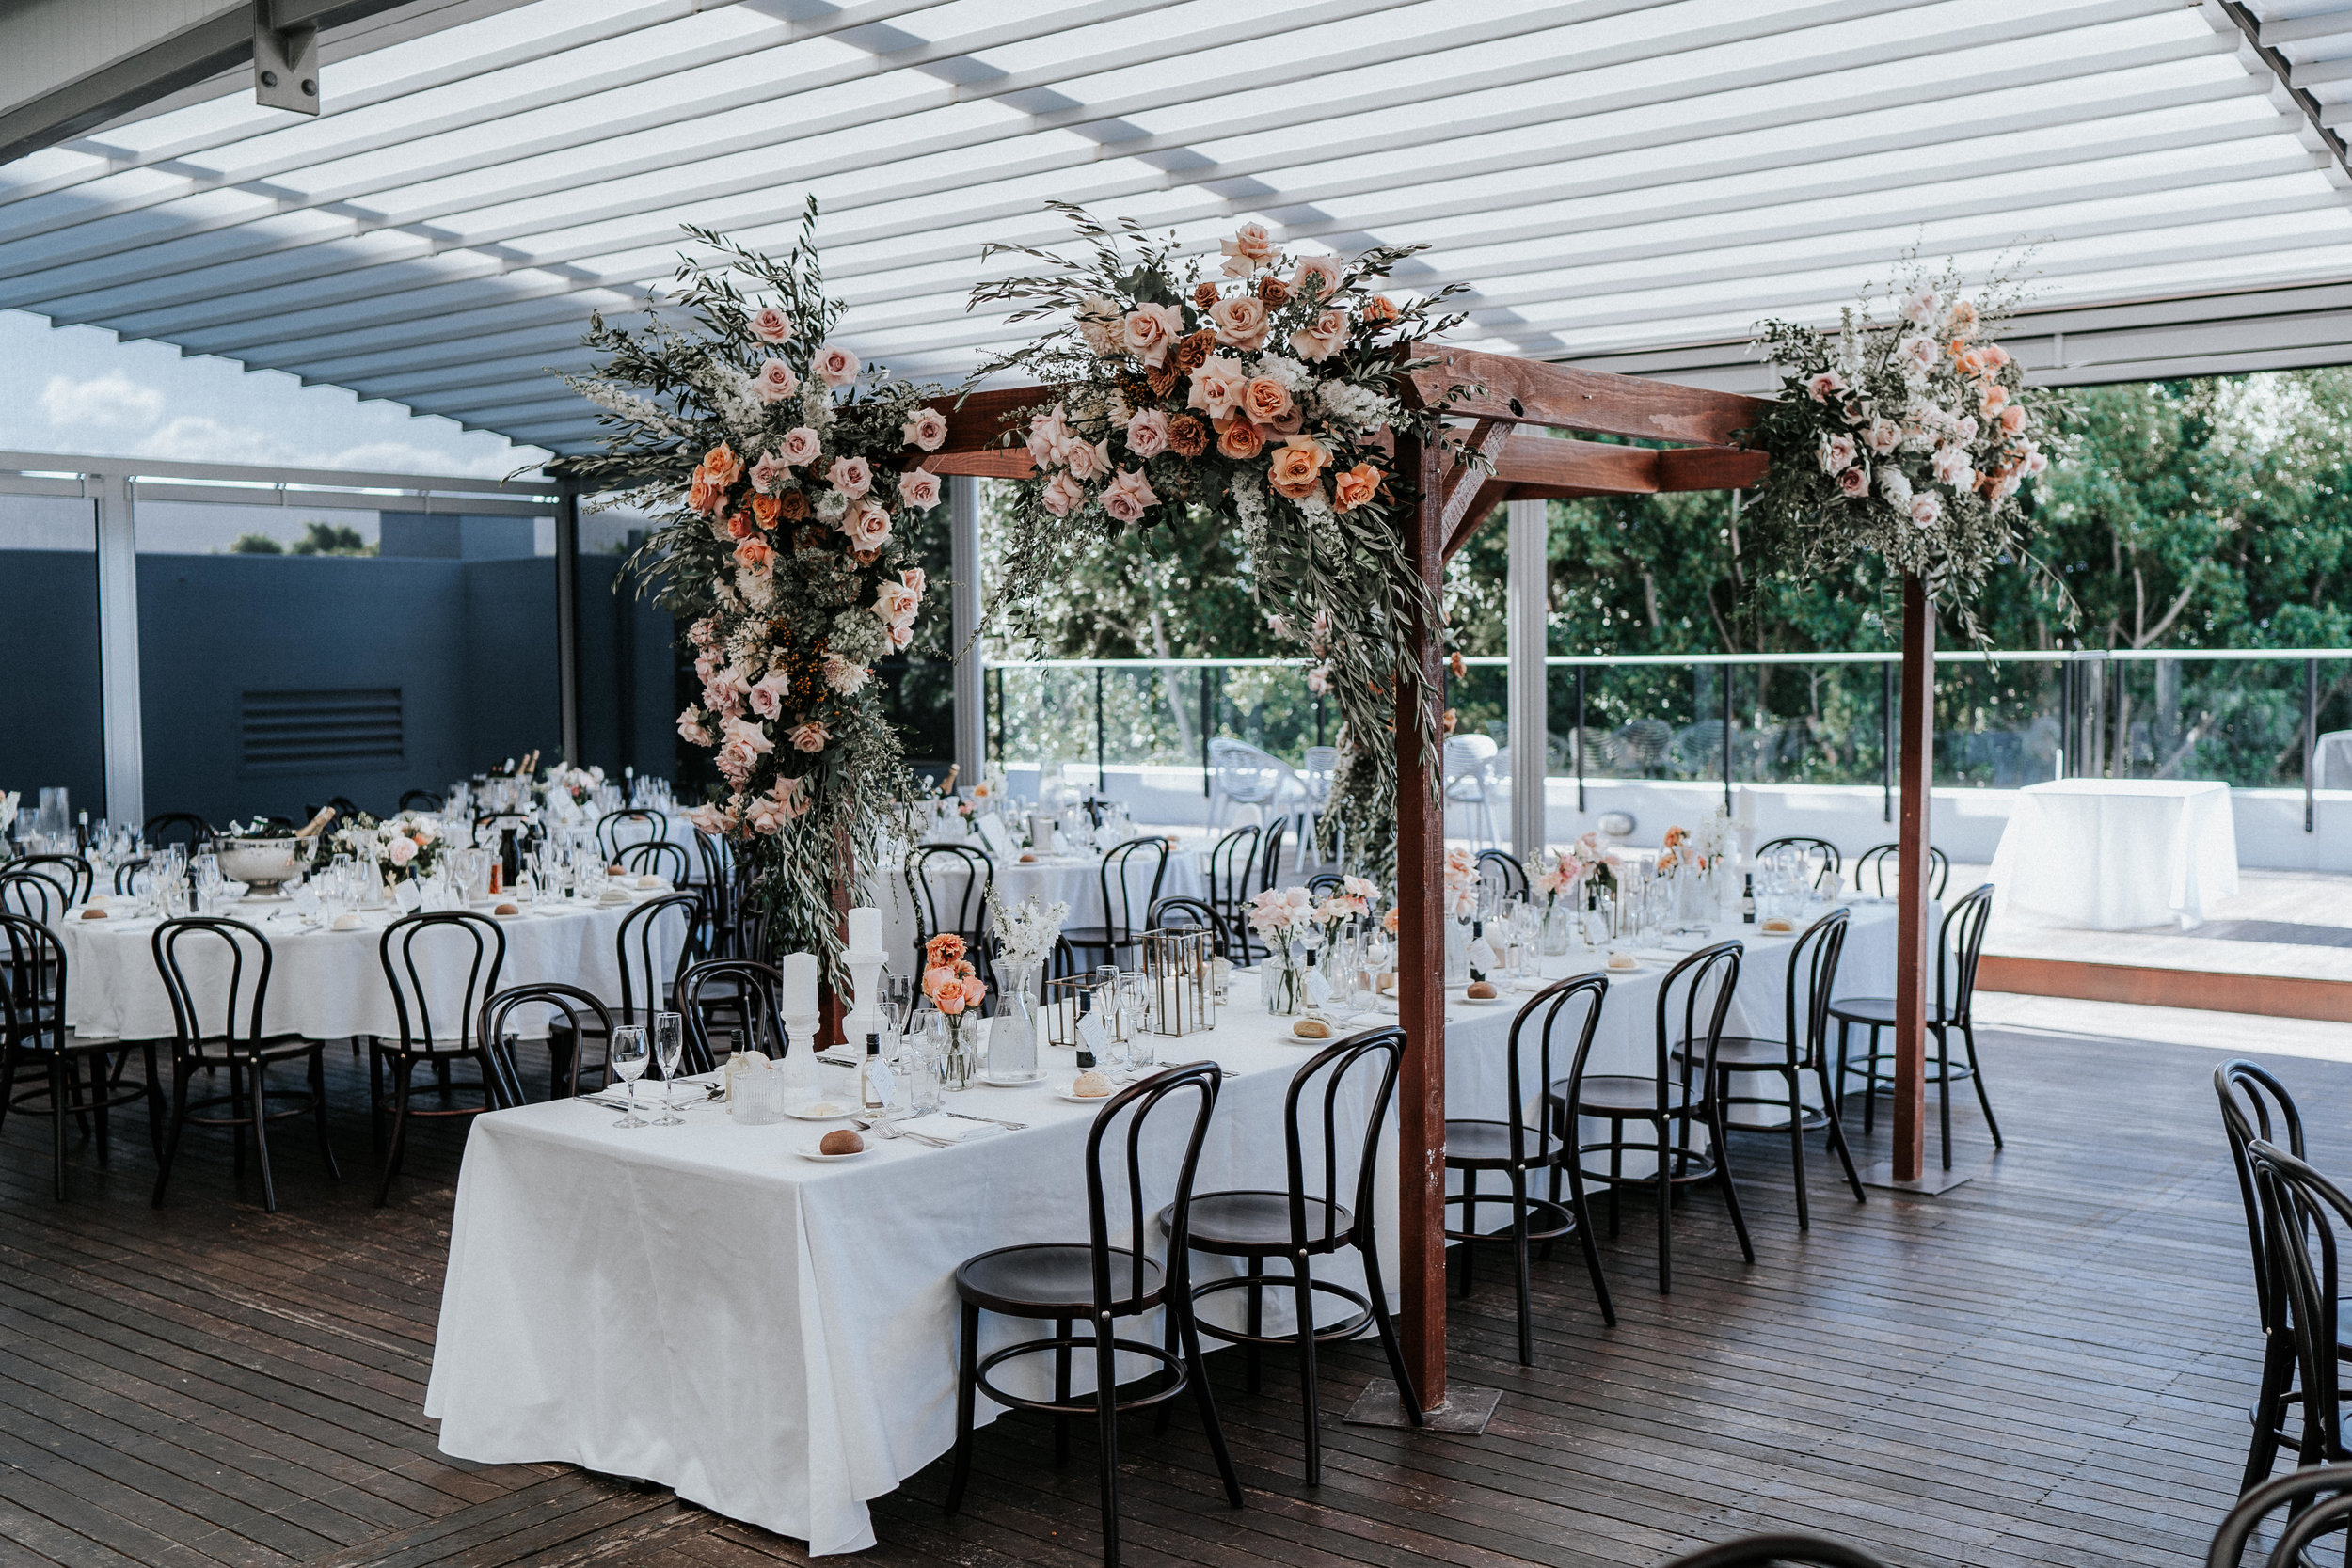 michelle-jonathon-harley-wedding-750.jpg